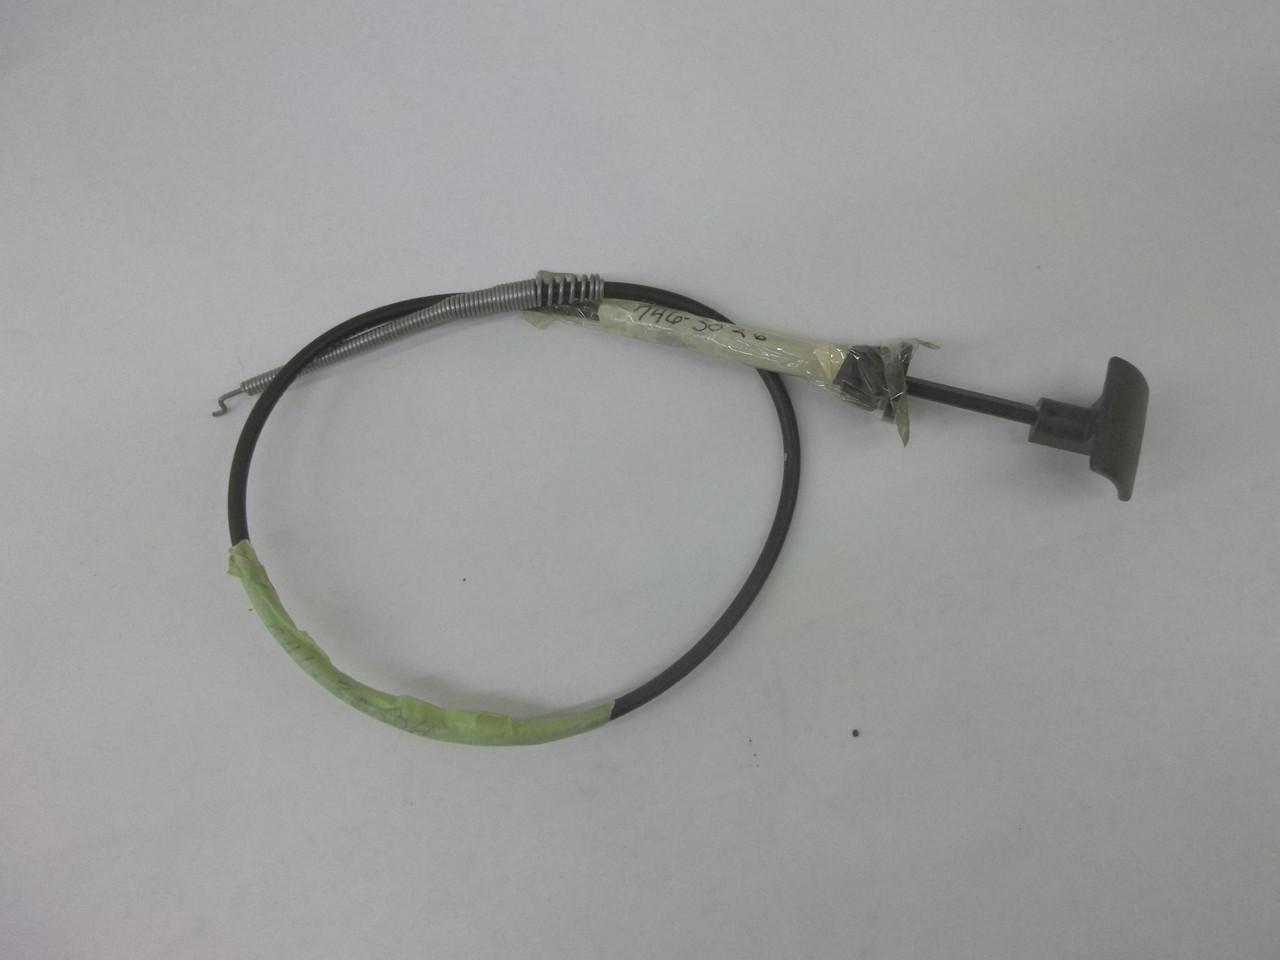 Cub Cadet I1046 Diagram Explained Wiring Diagrams 1315 1320 Throttle Data U2022 Drive Belt